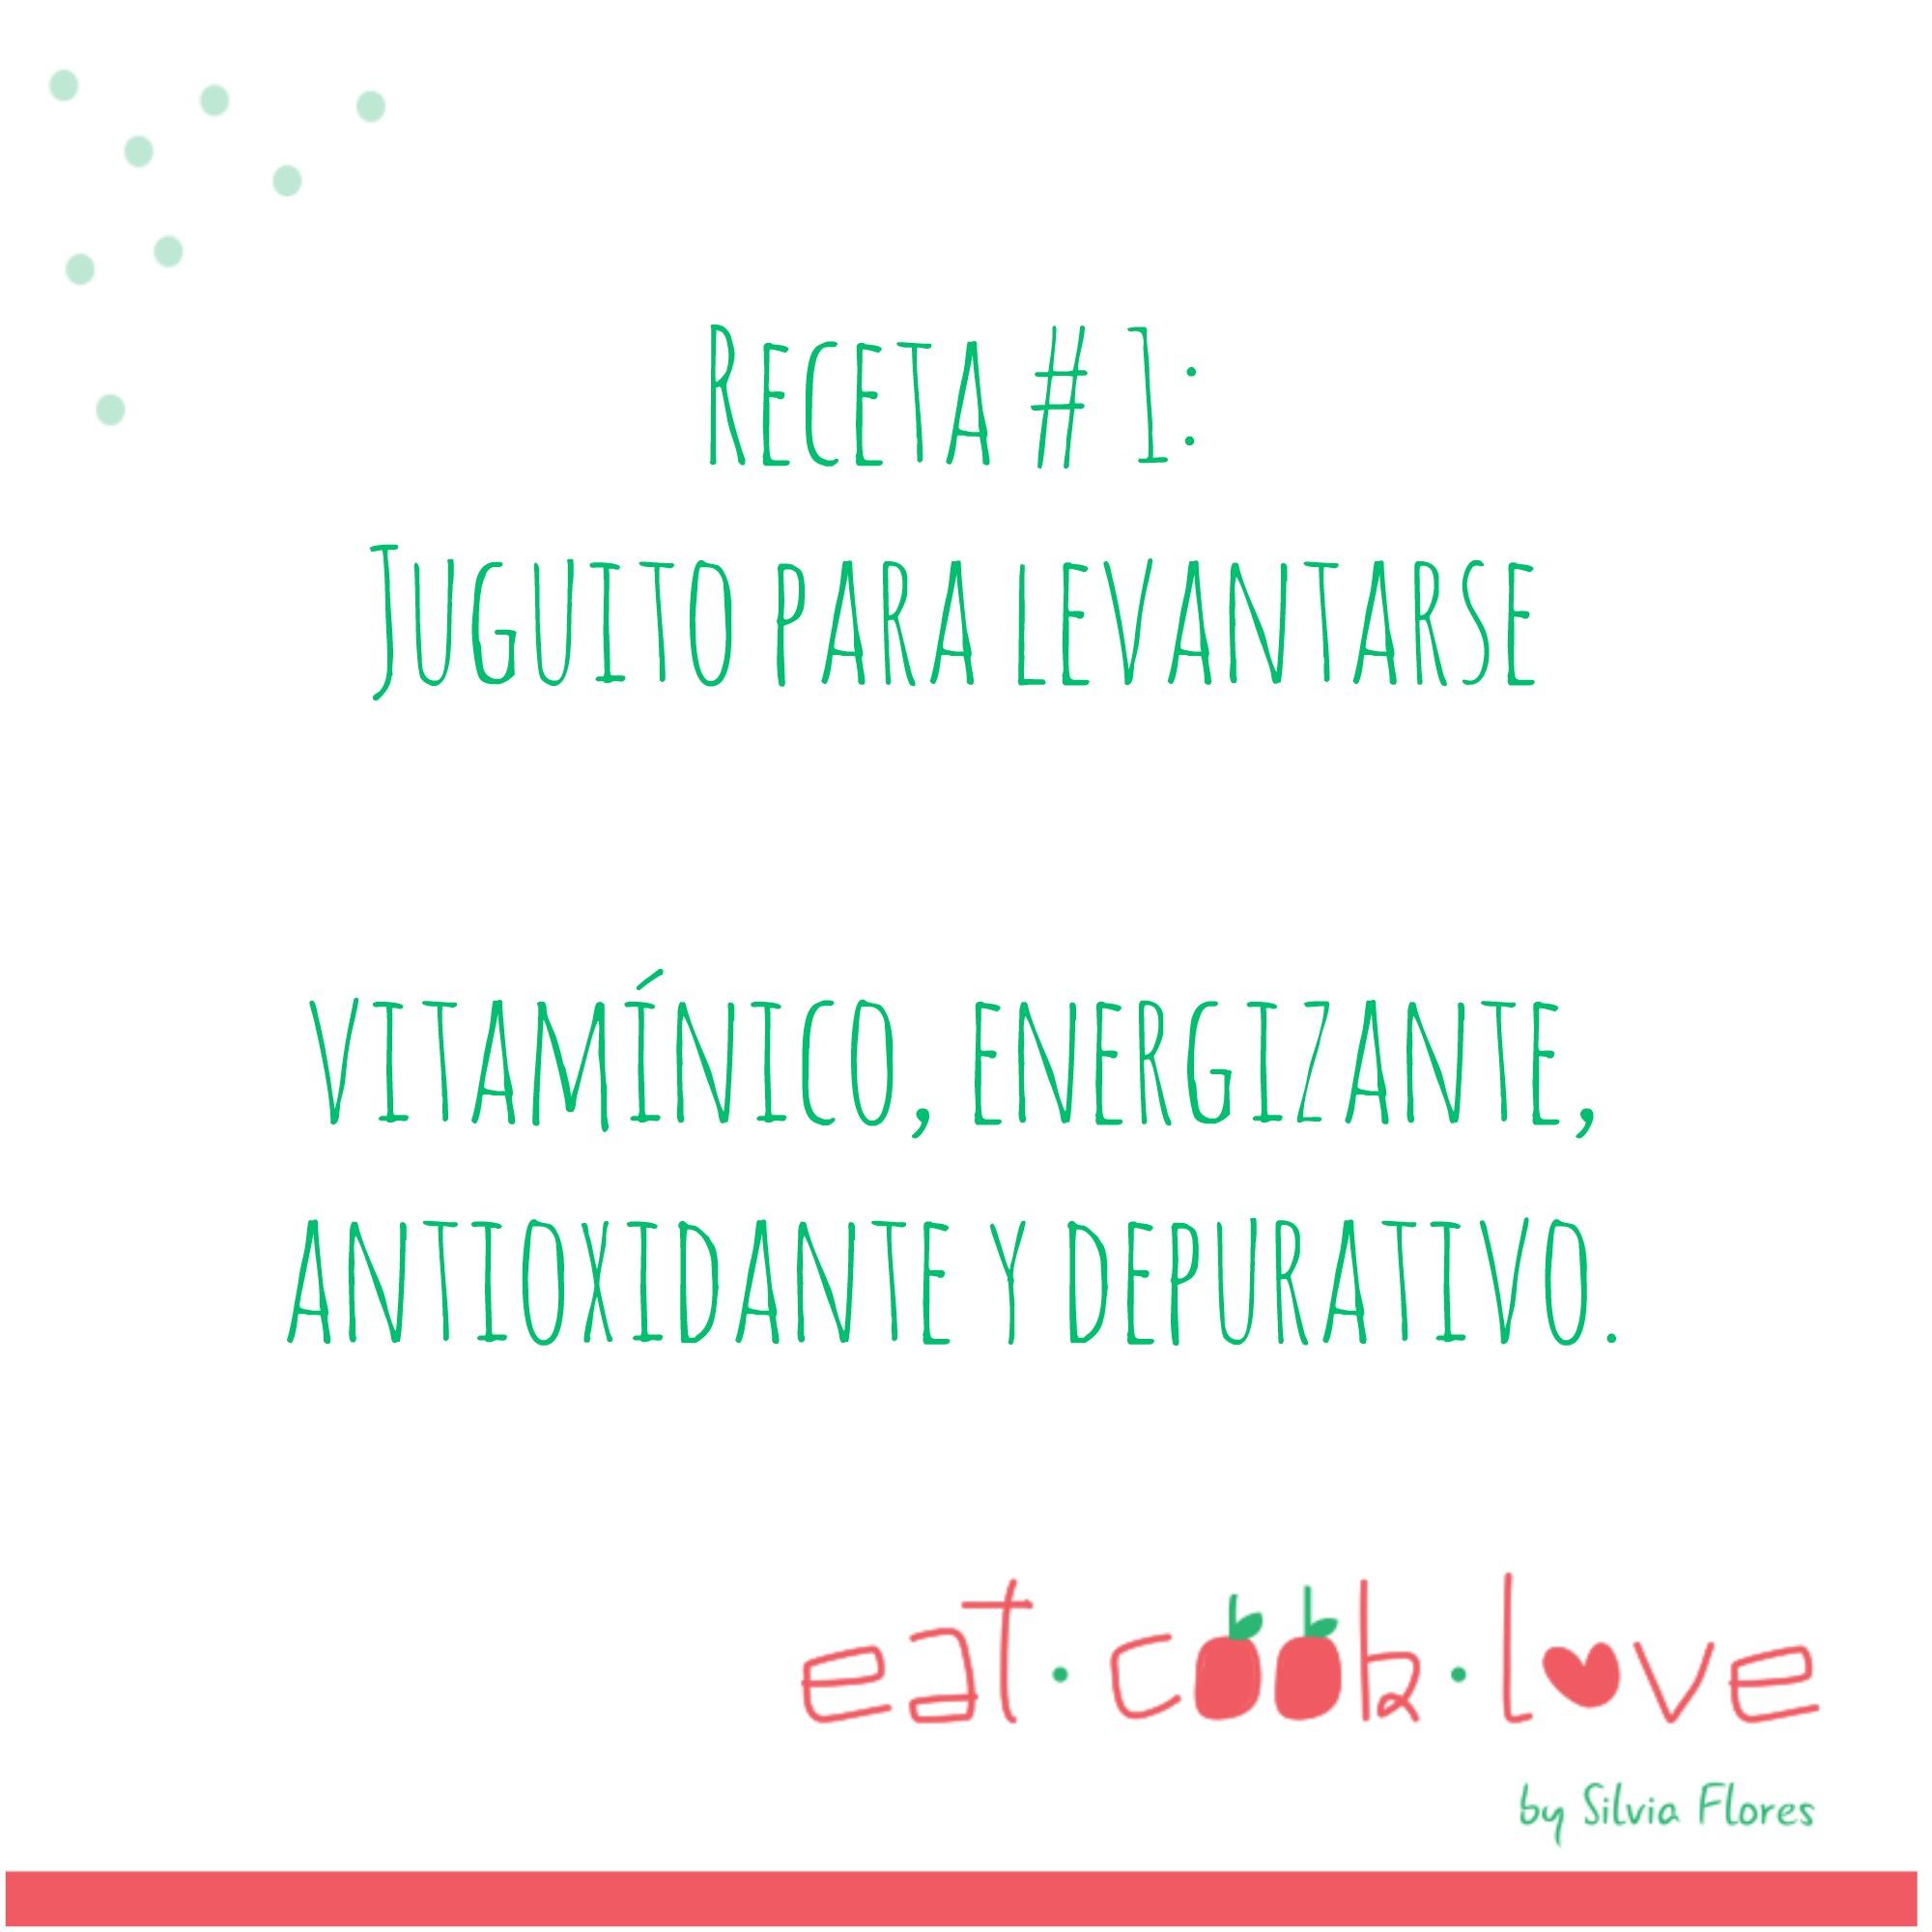 Eat, Cook, Love ©